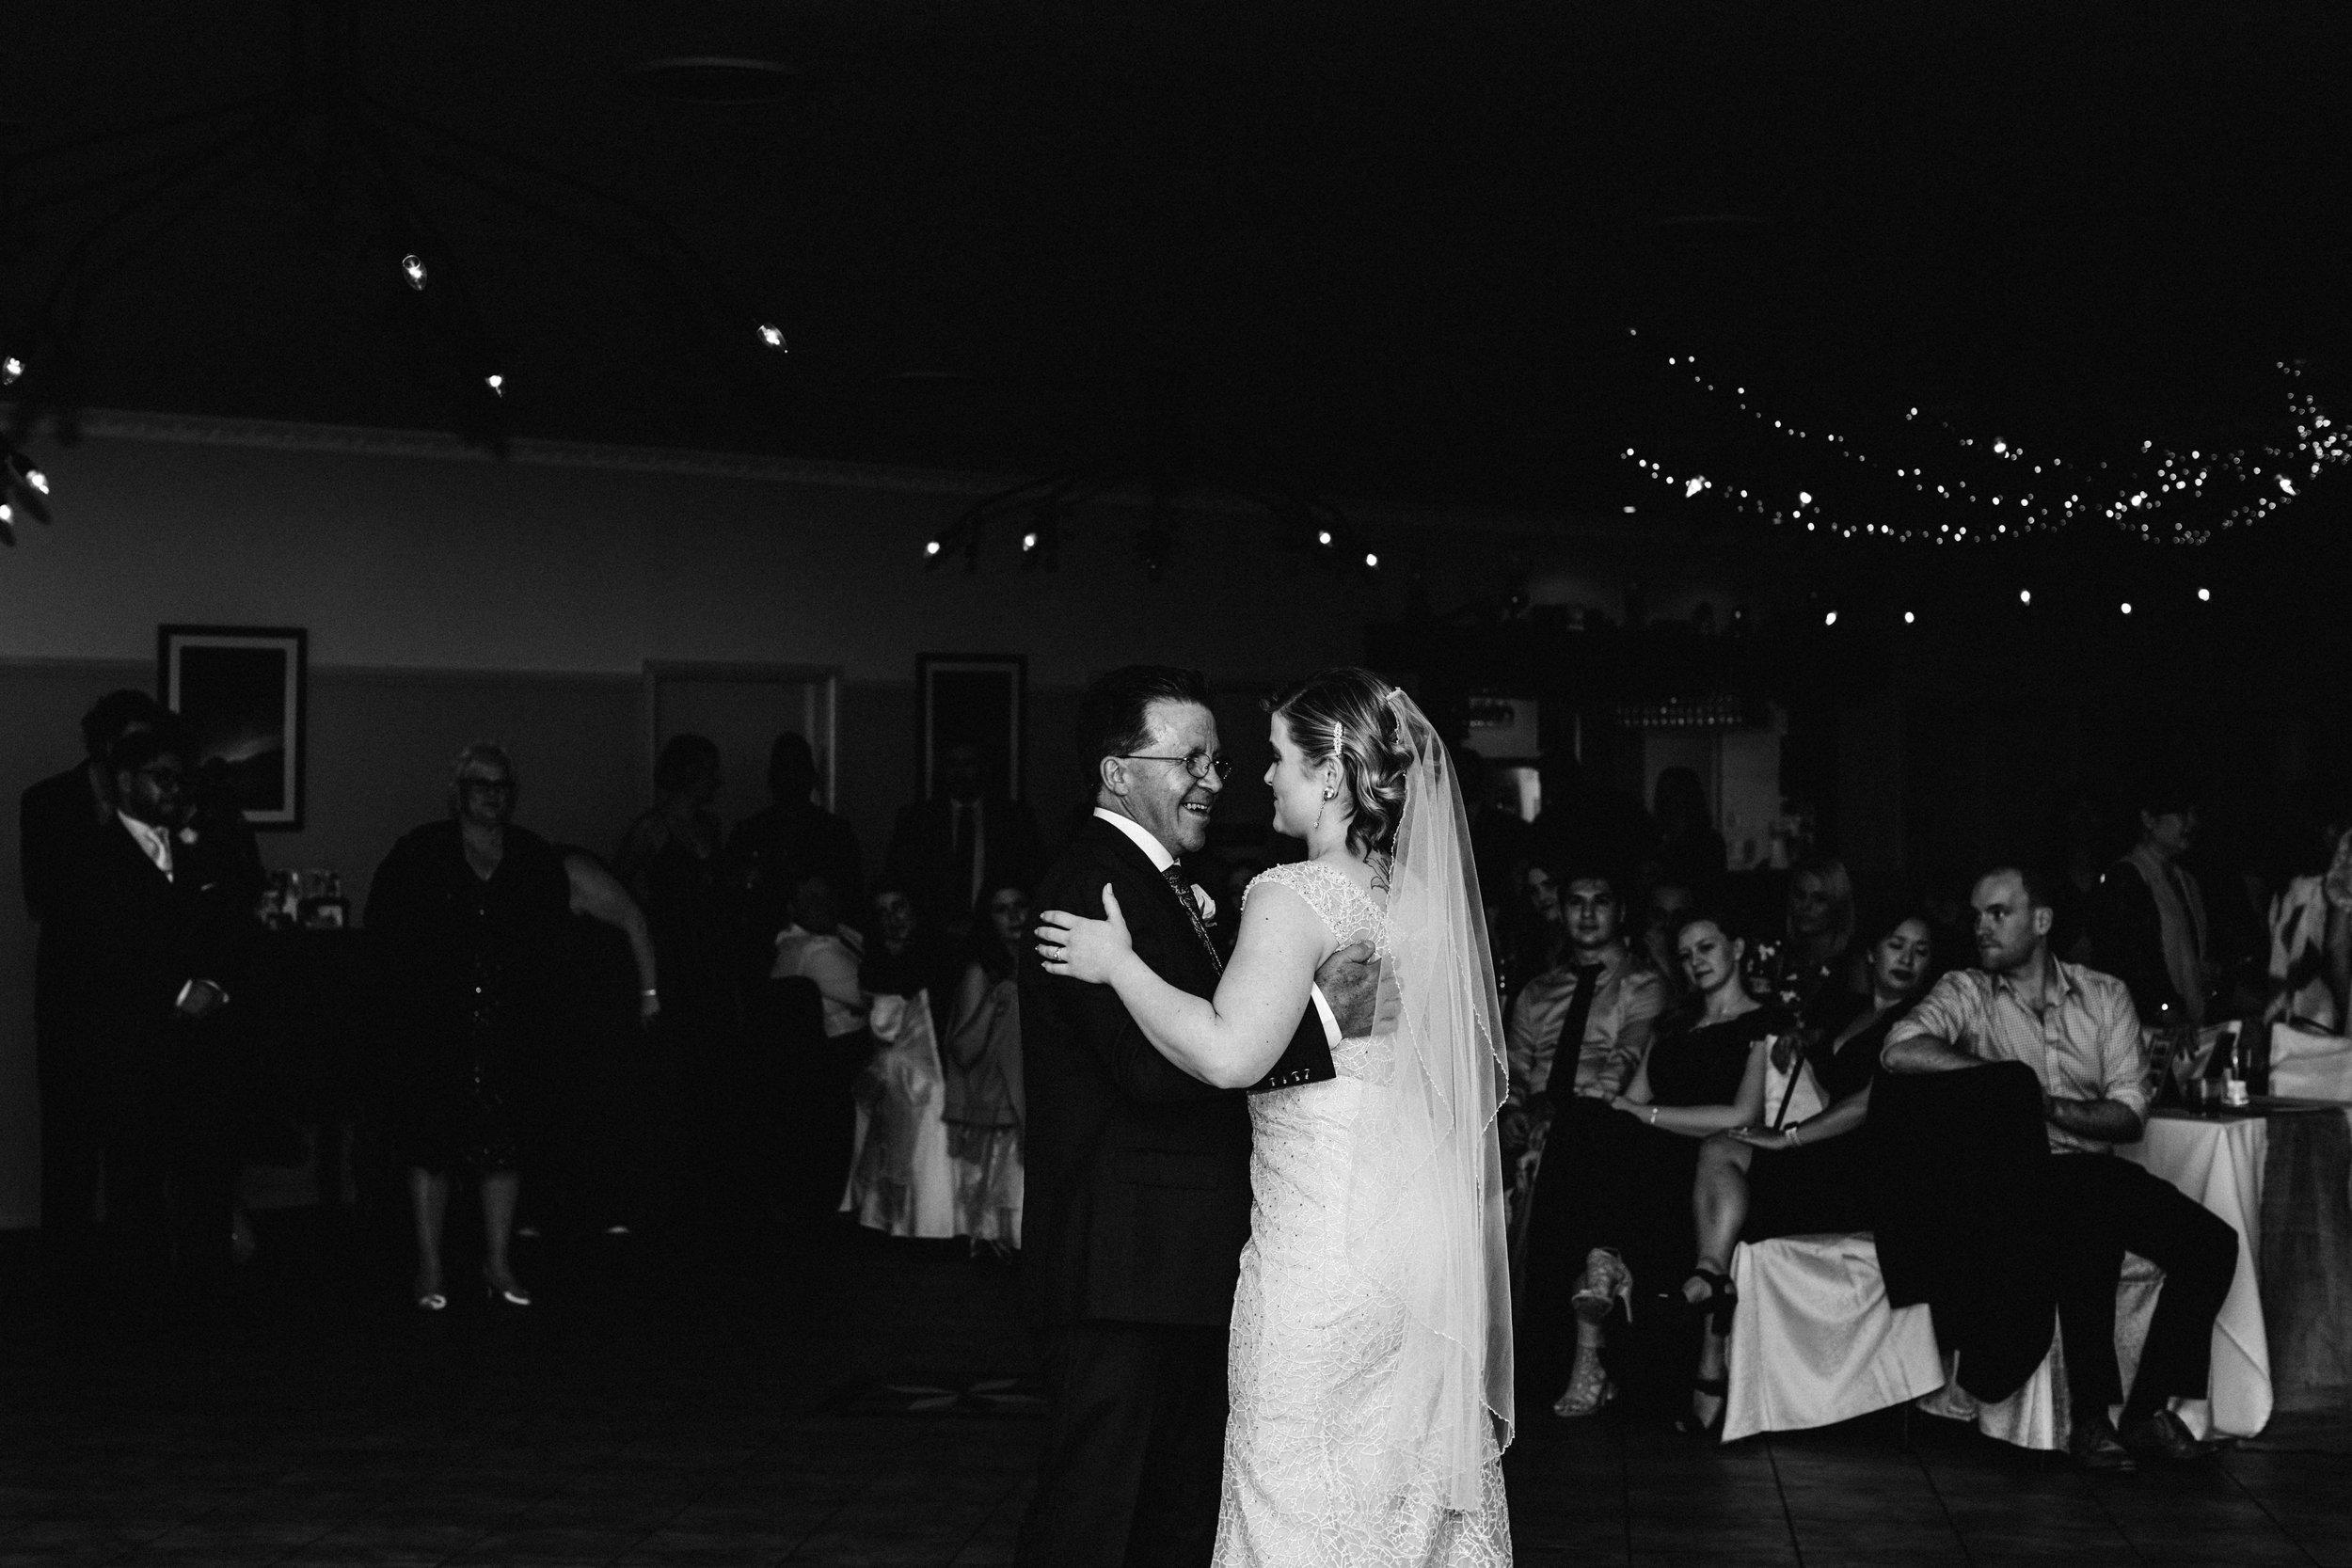 appin-house-wedding-macarthur-www.emilyobrienphotography.net-176.jpg